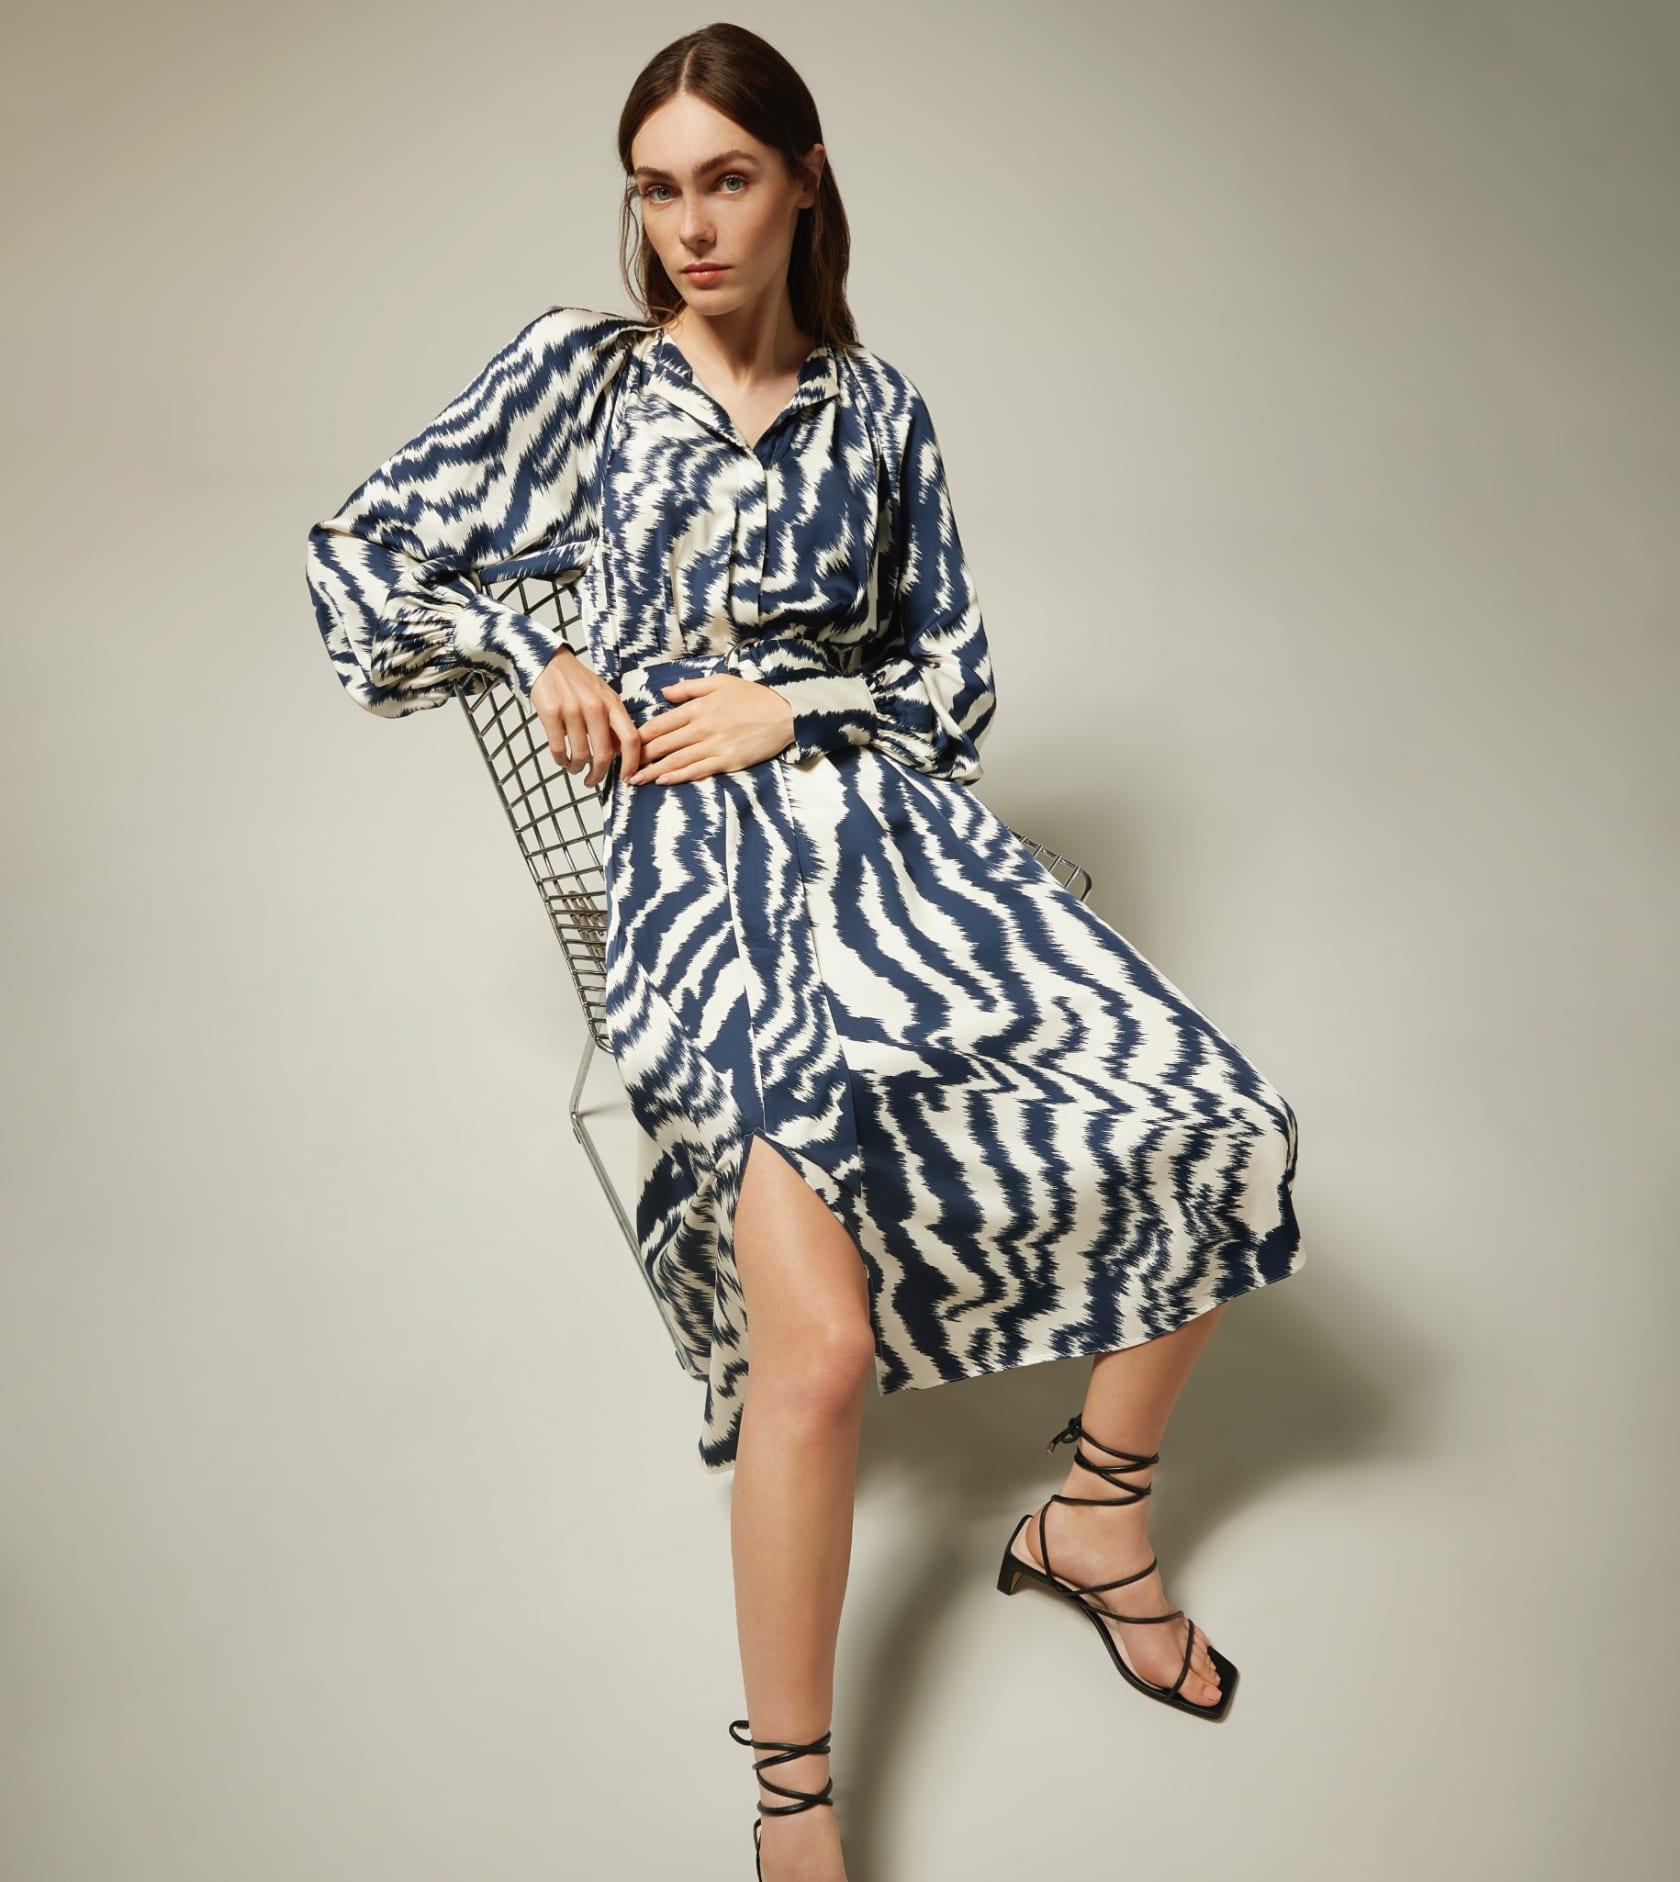 SANDIIA Printed long sleeved midi dress cuffs